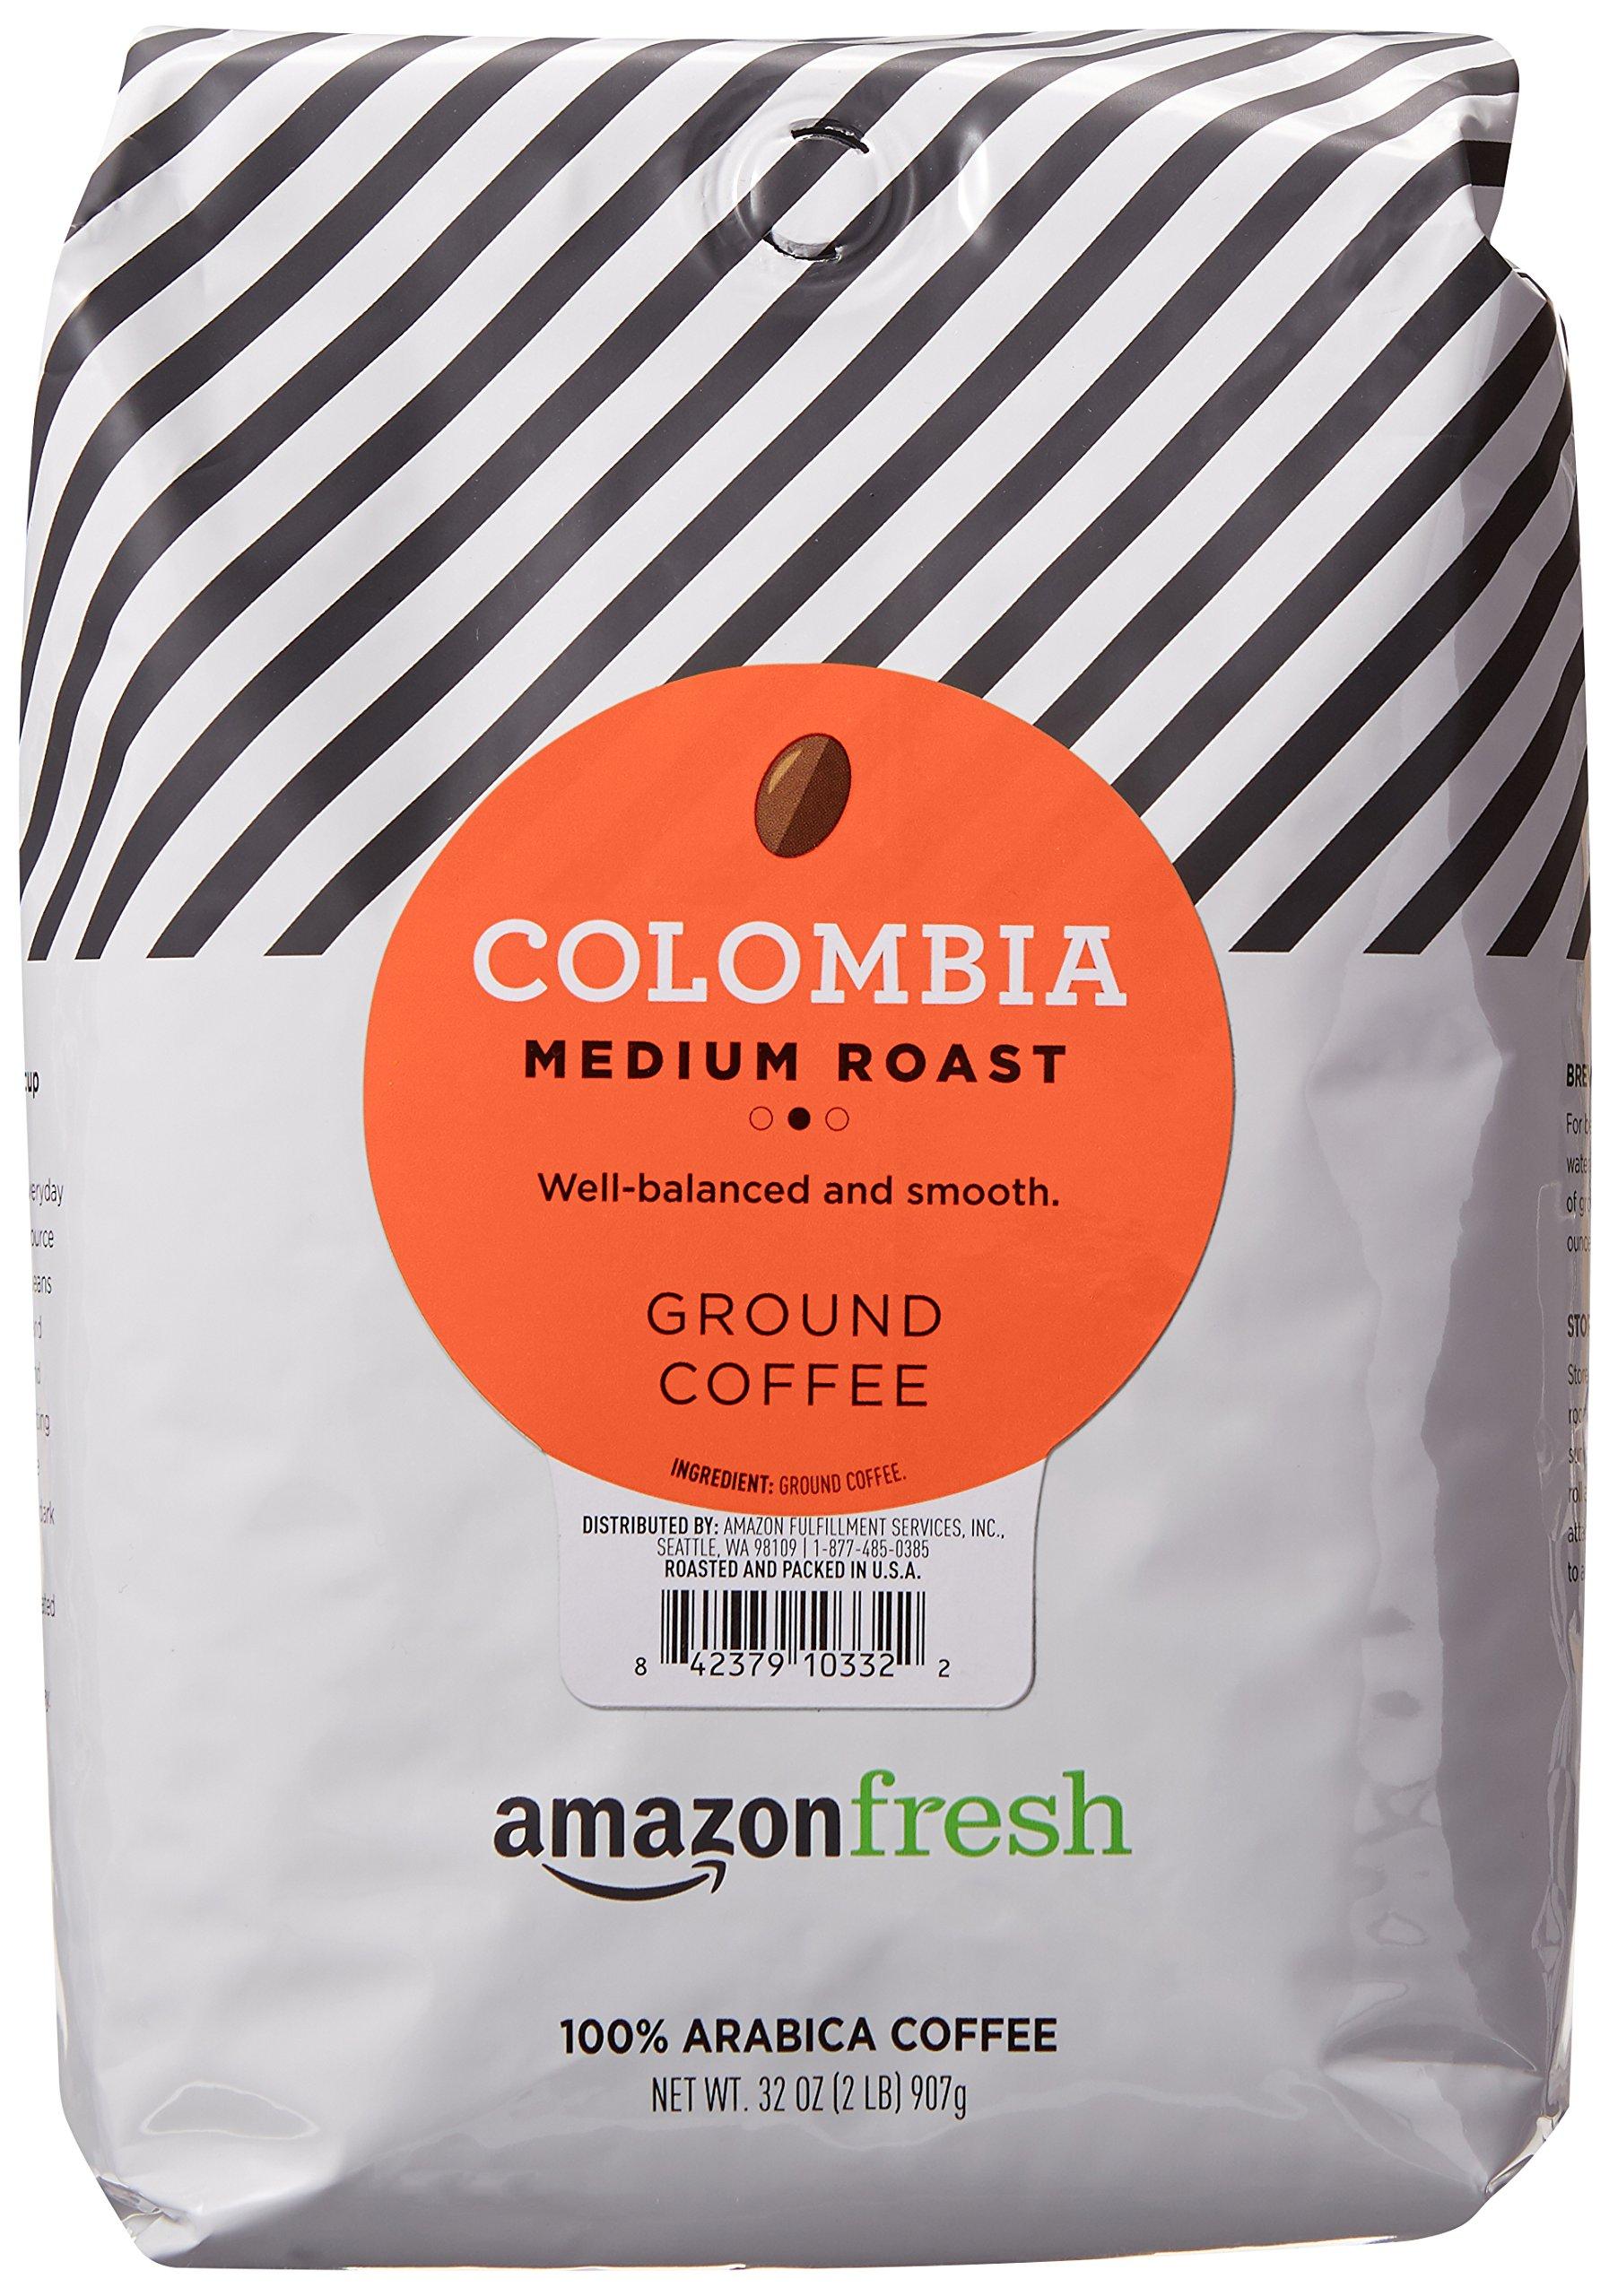 AmazonFresh Colombia Ground Coffee, Medium Roast, 32 Ounce by AmazonFresh